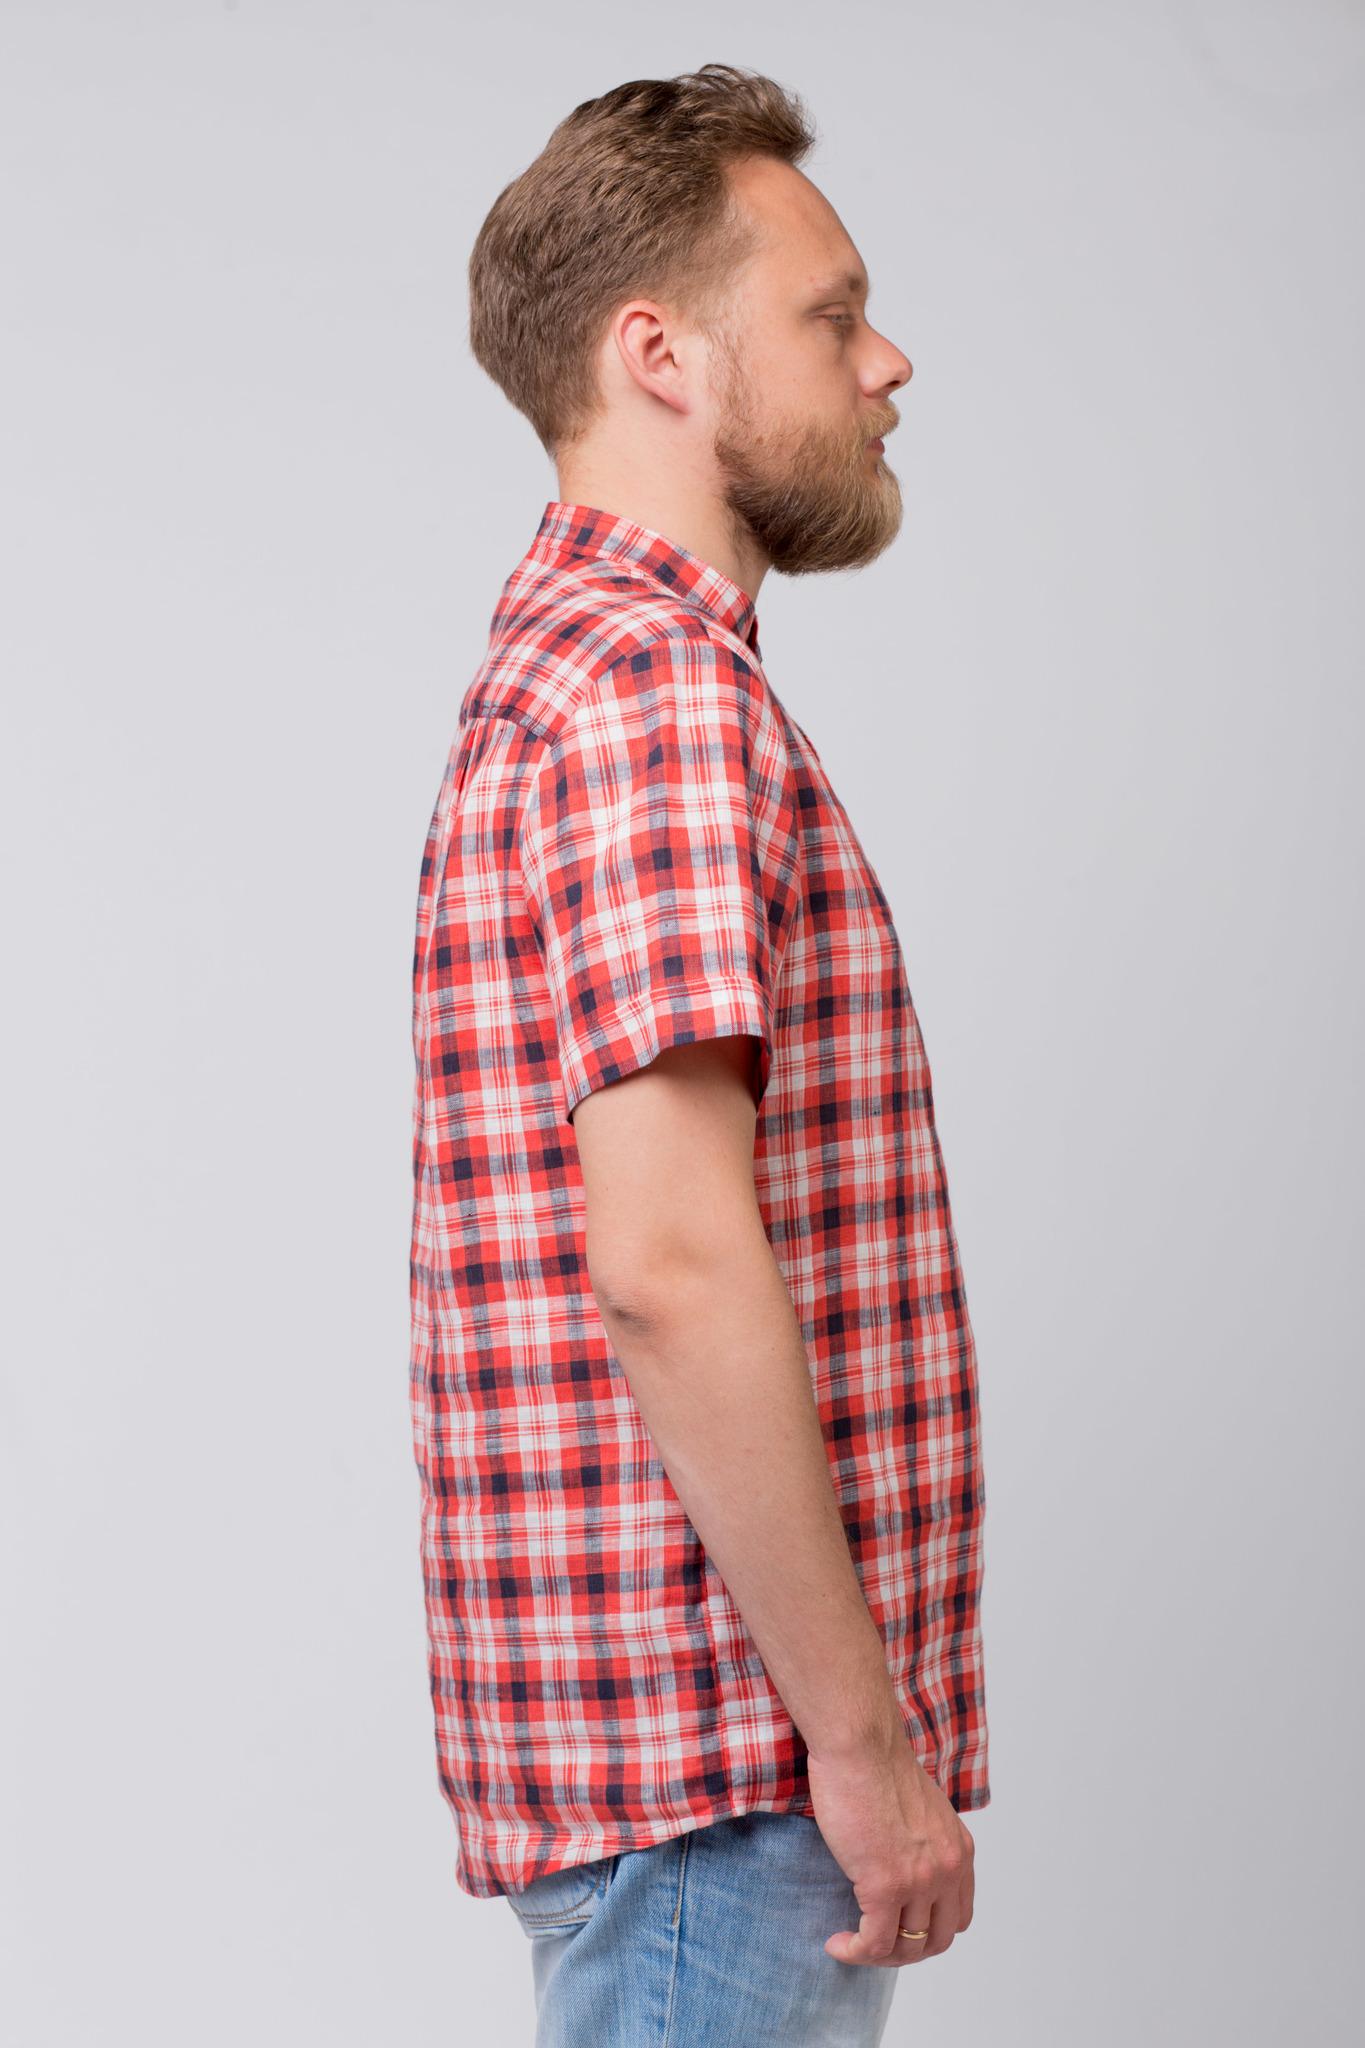 Рубашка льняная Амурская вид сбоку